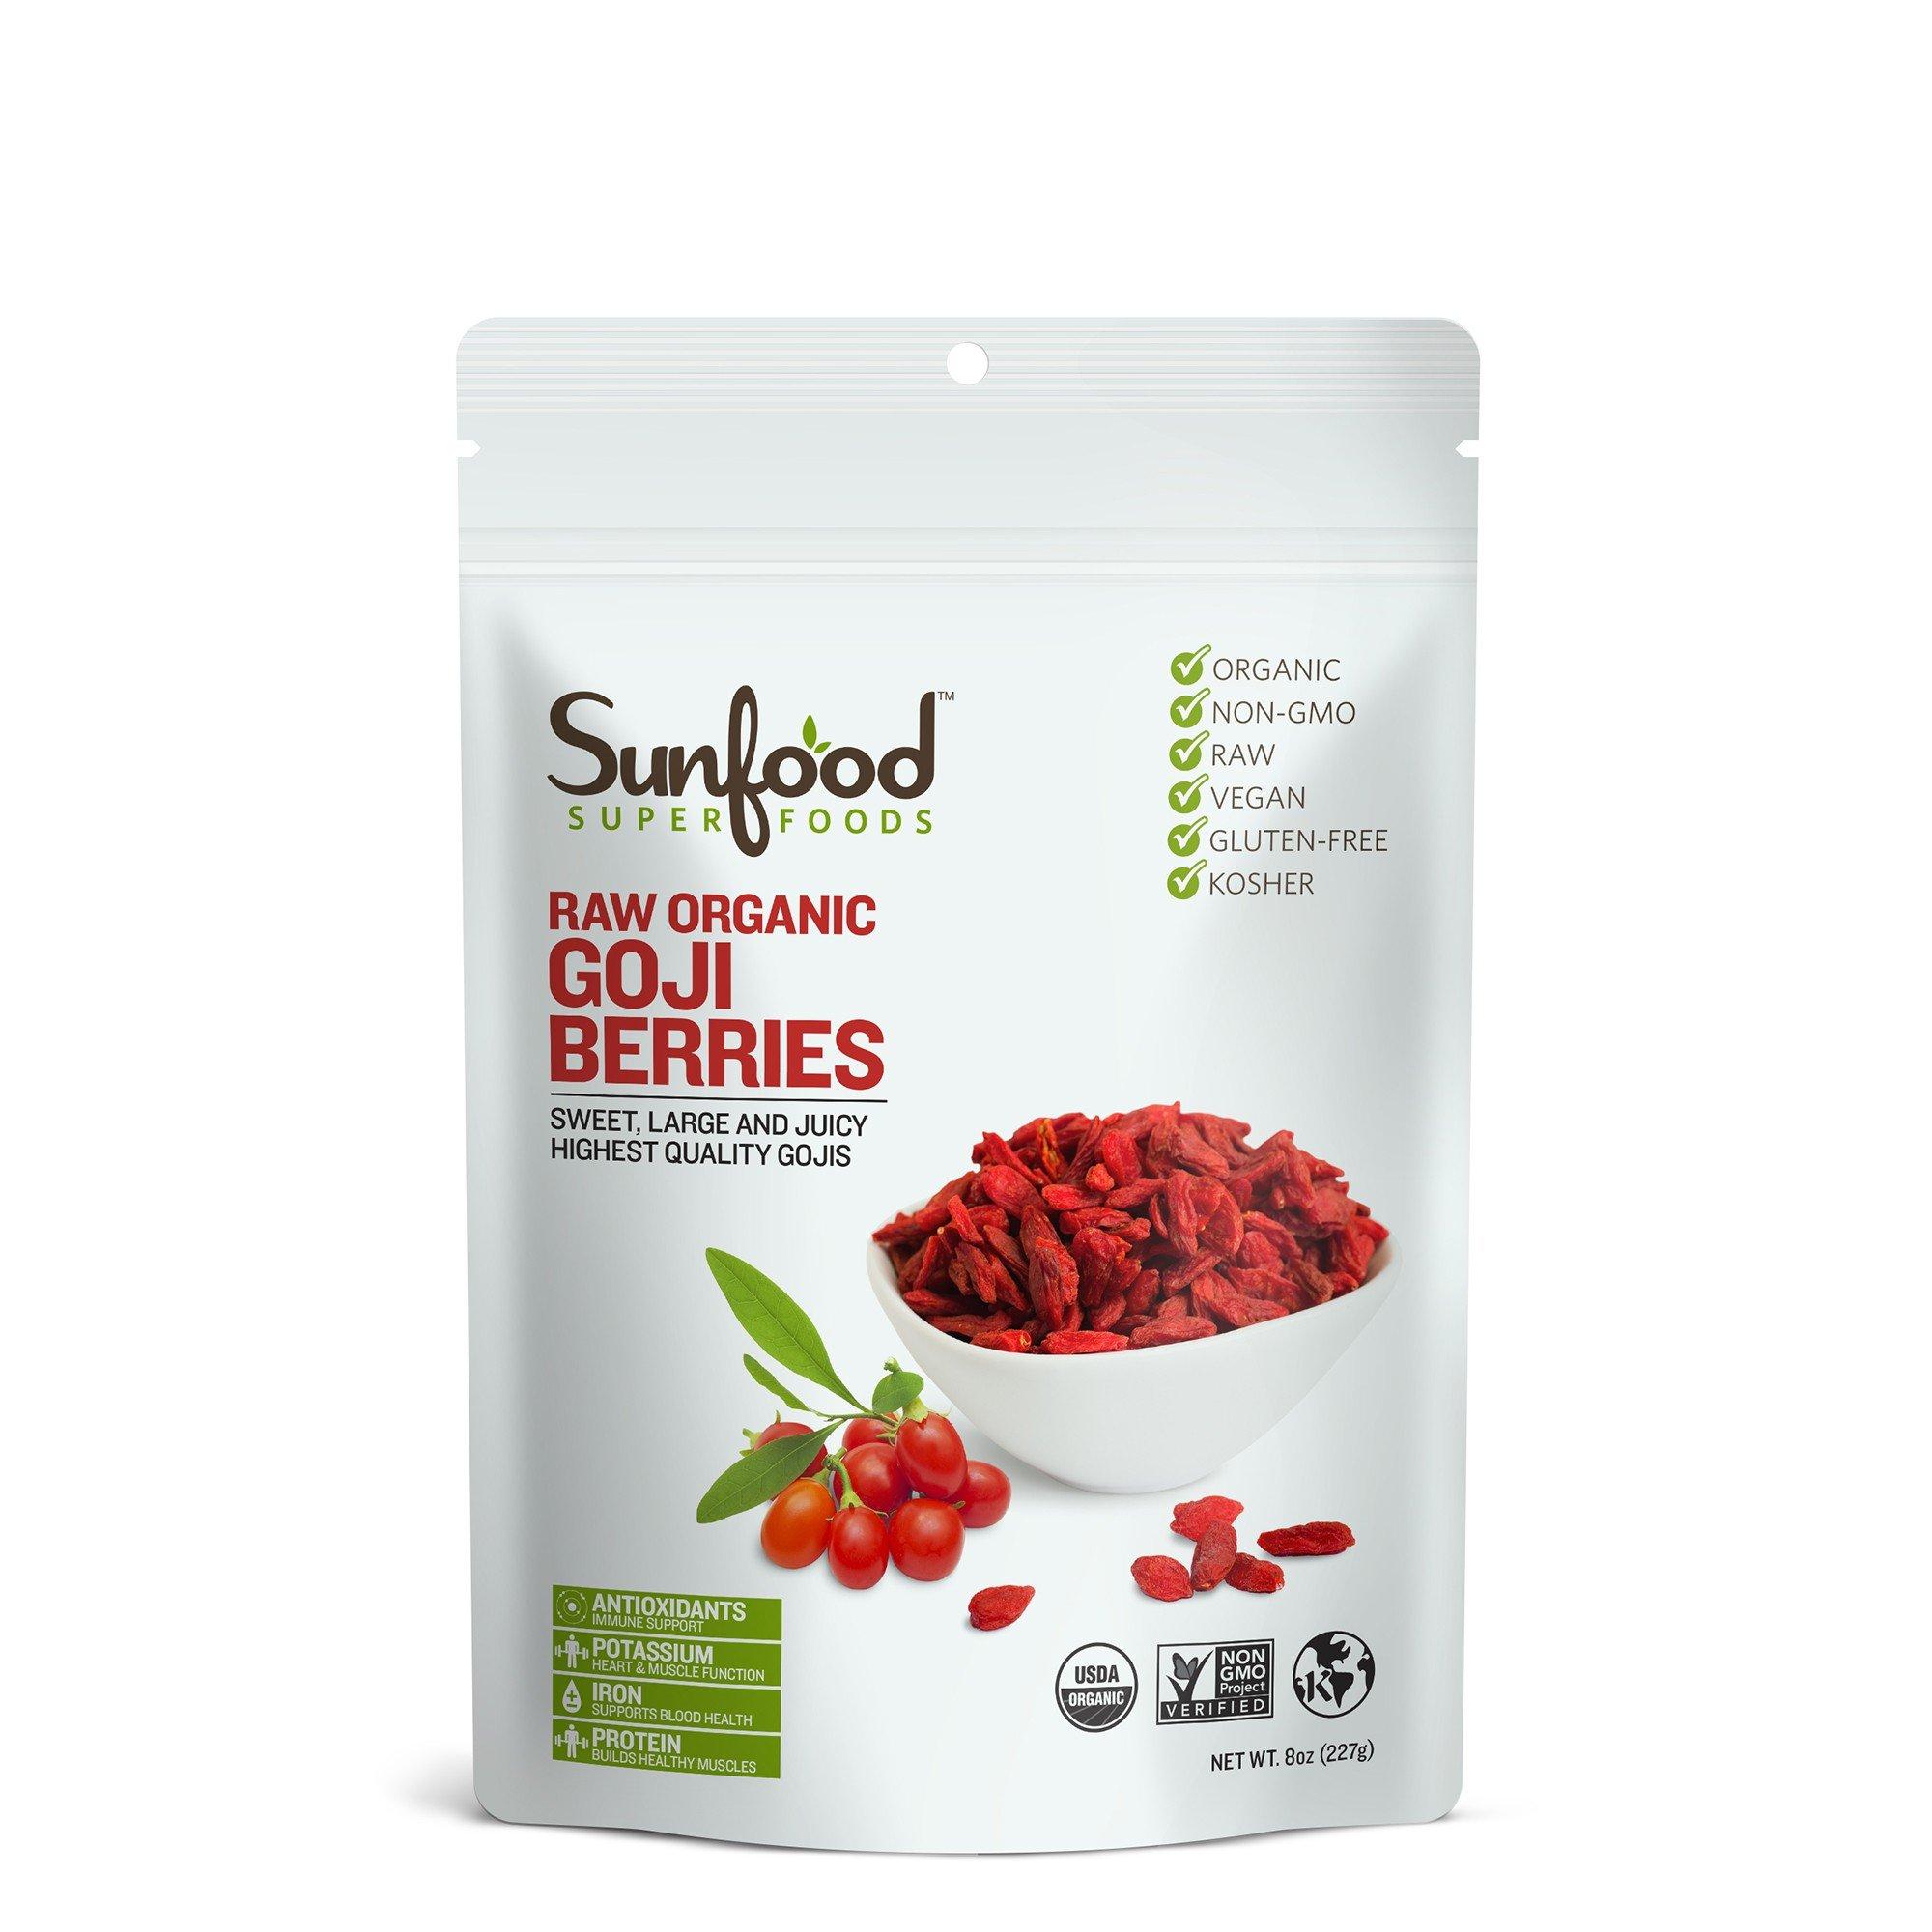 Sunfood Goji Berries, Certified Organic, Non-GMO, 8oz